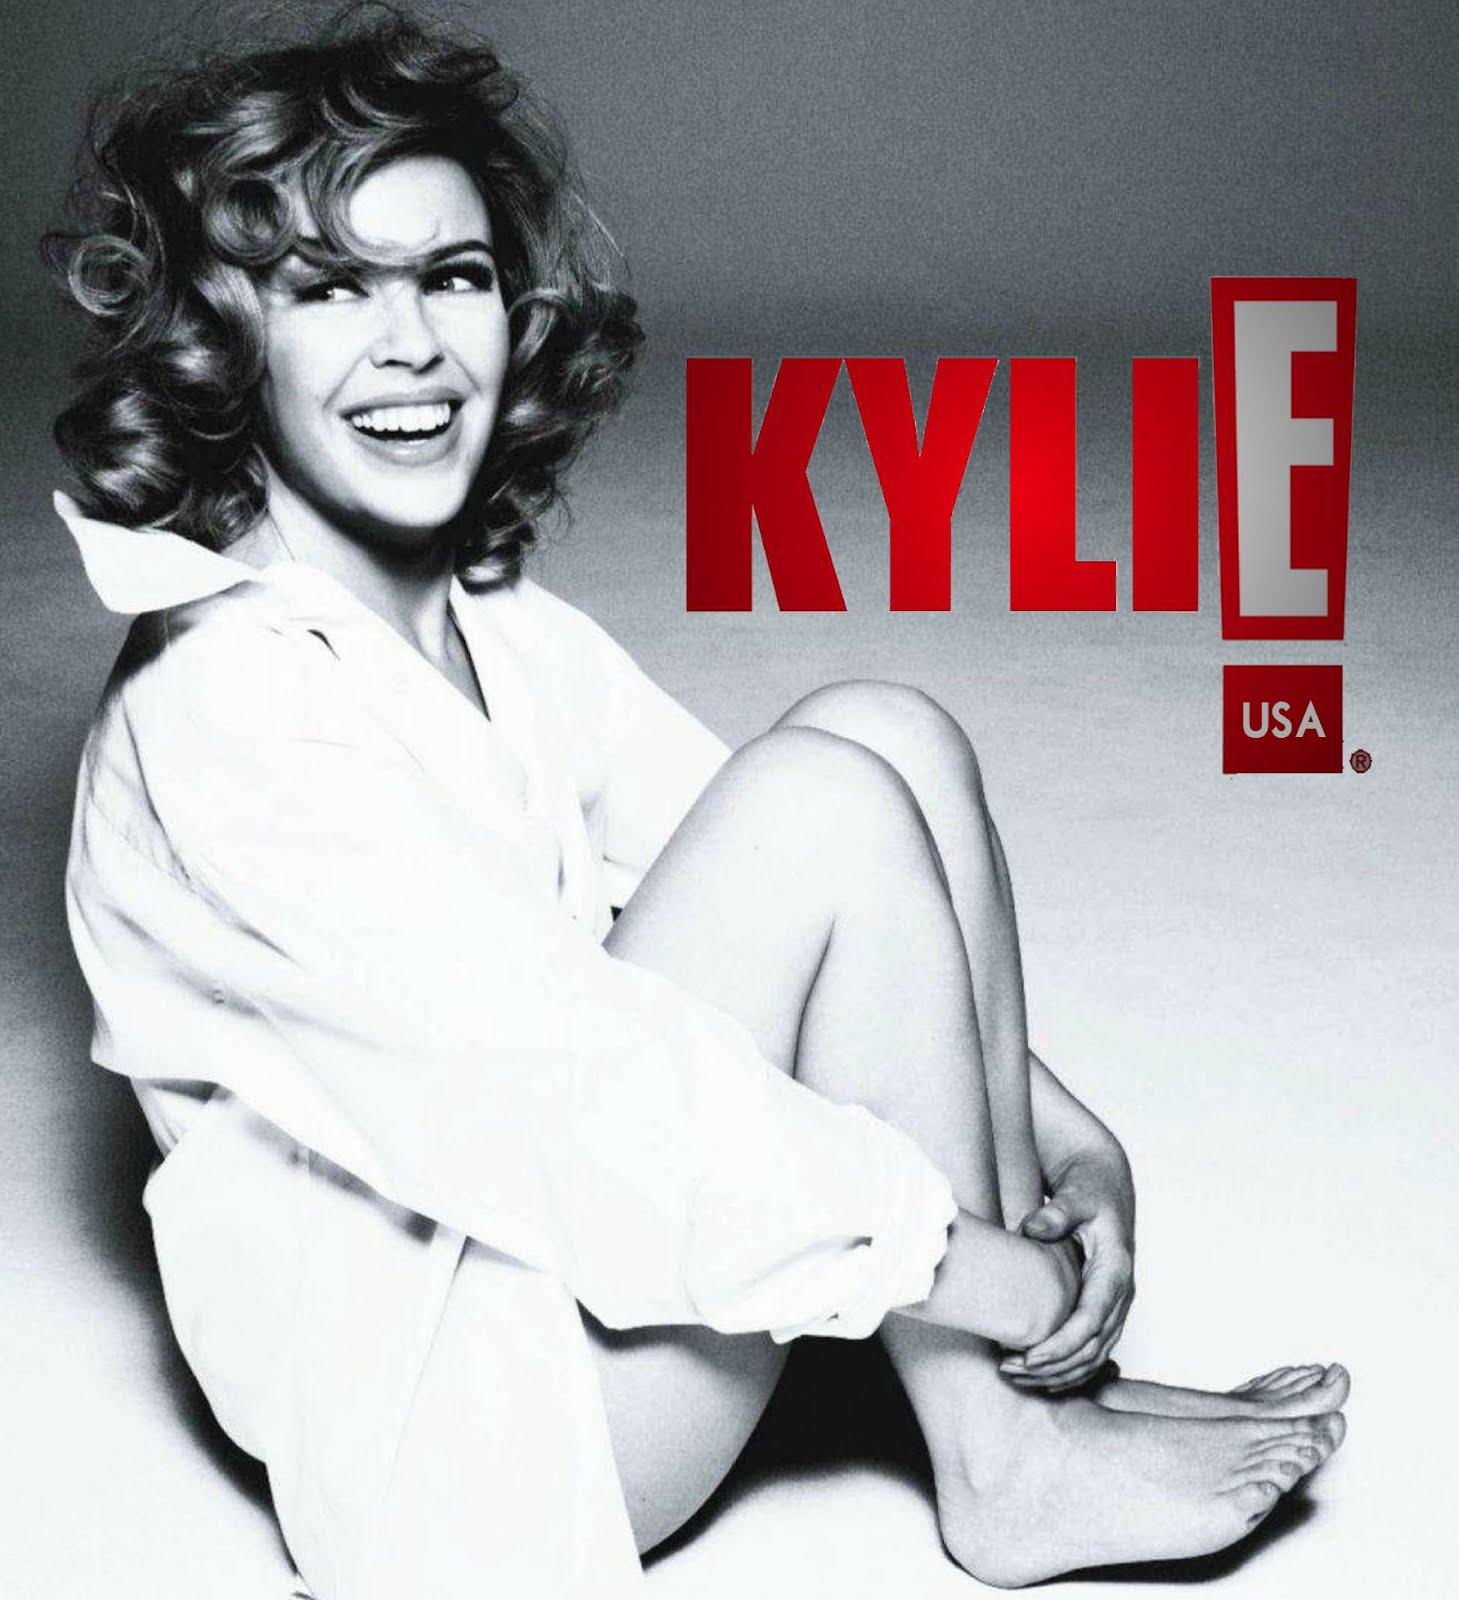 http://4.bp.blogspot.com/-6JpWcsOBz7o/T-JNYyds6yI/AAAAAAAAJdY/5AcaWr34_O4/s1600/Kylie%2BE%2521.jpg